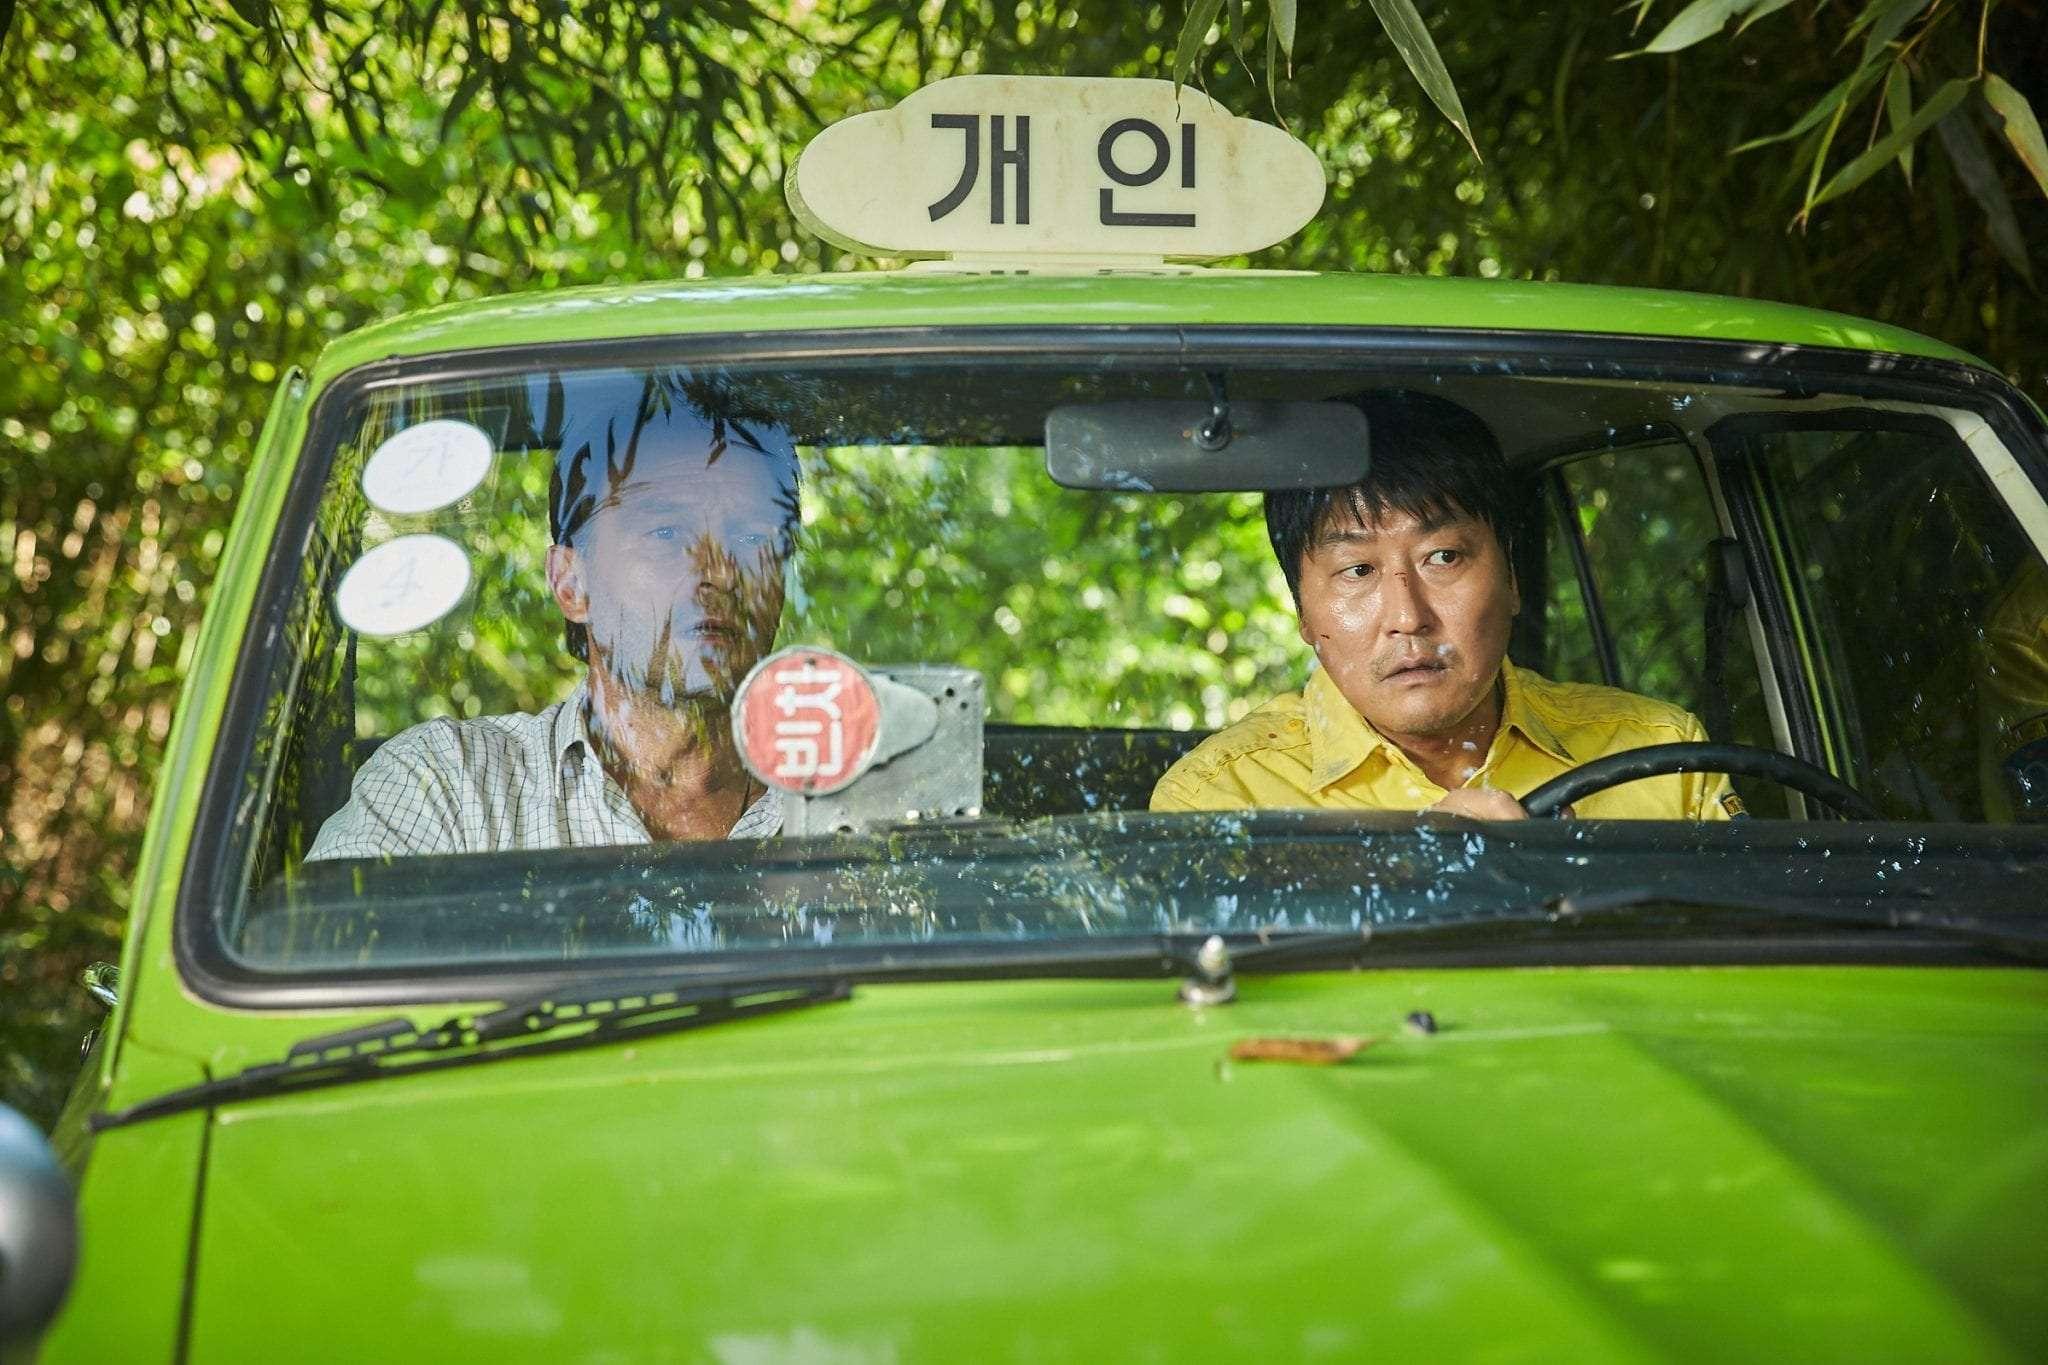 Festival Han Cine 2020: A Taxi Driver